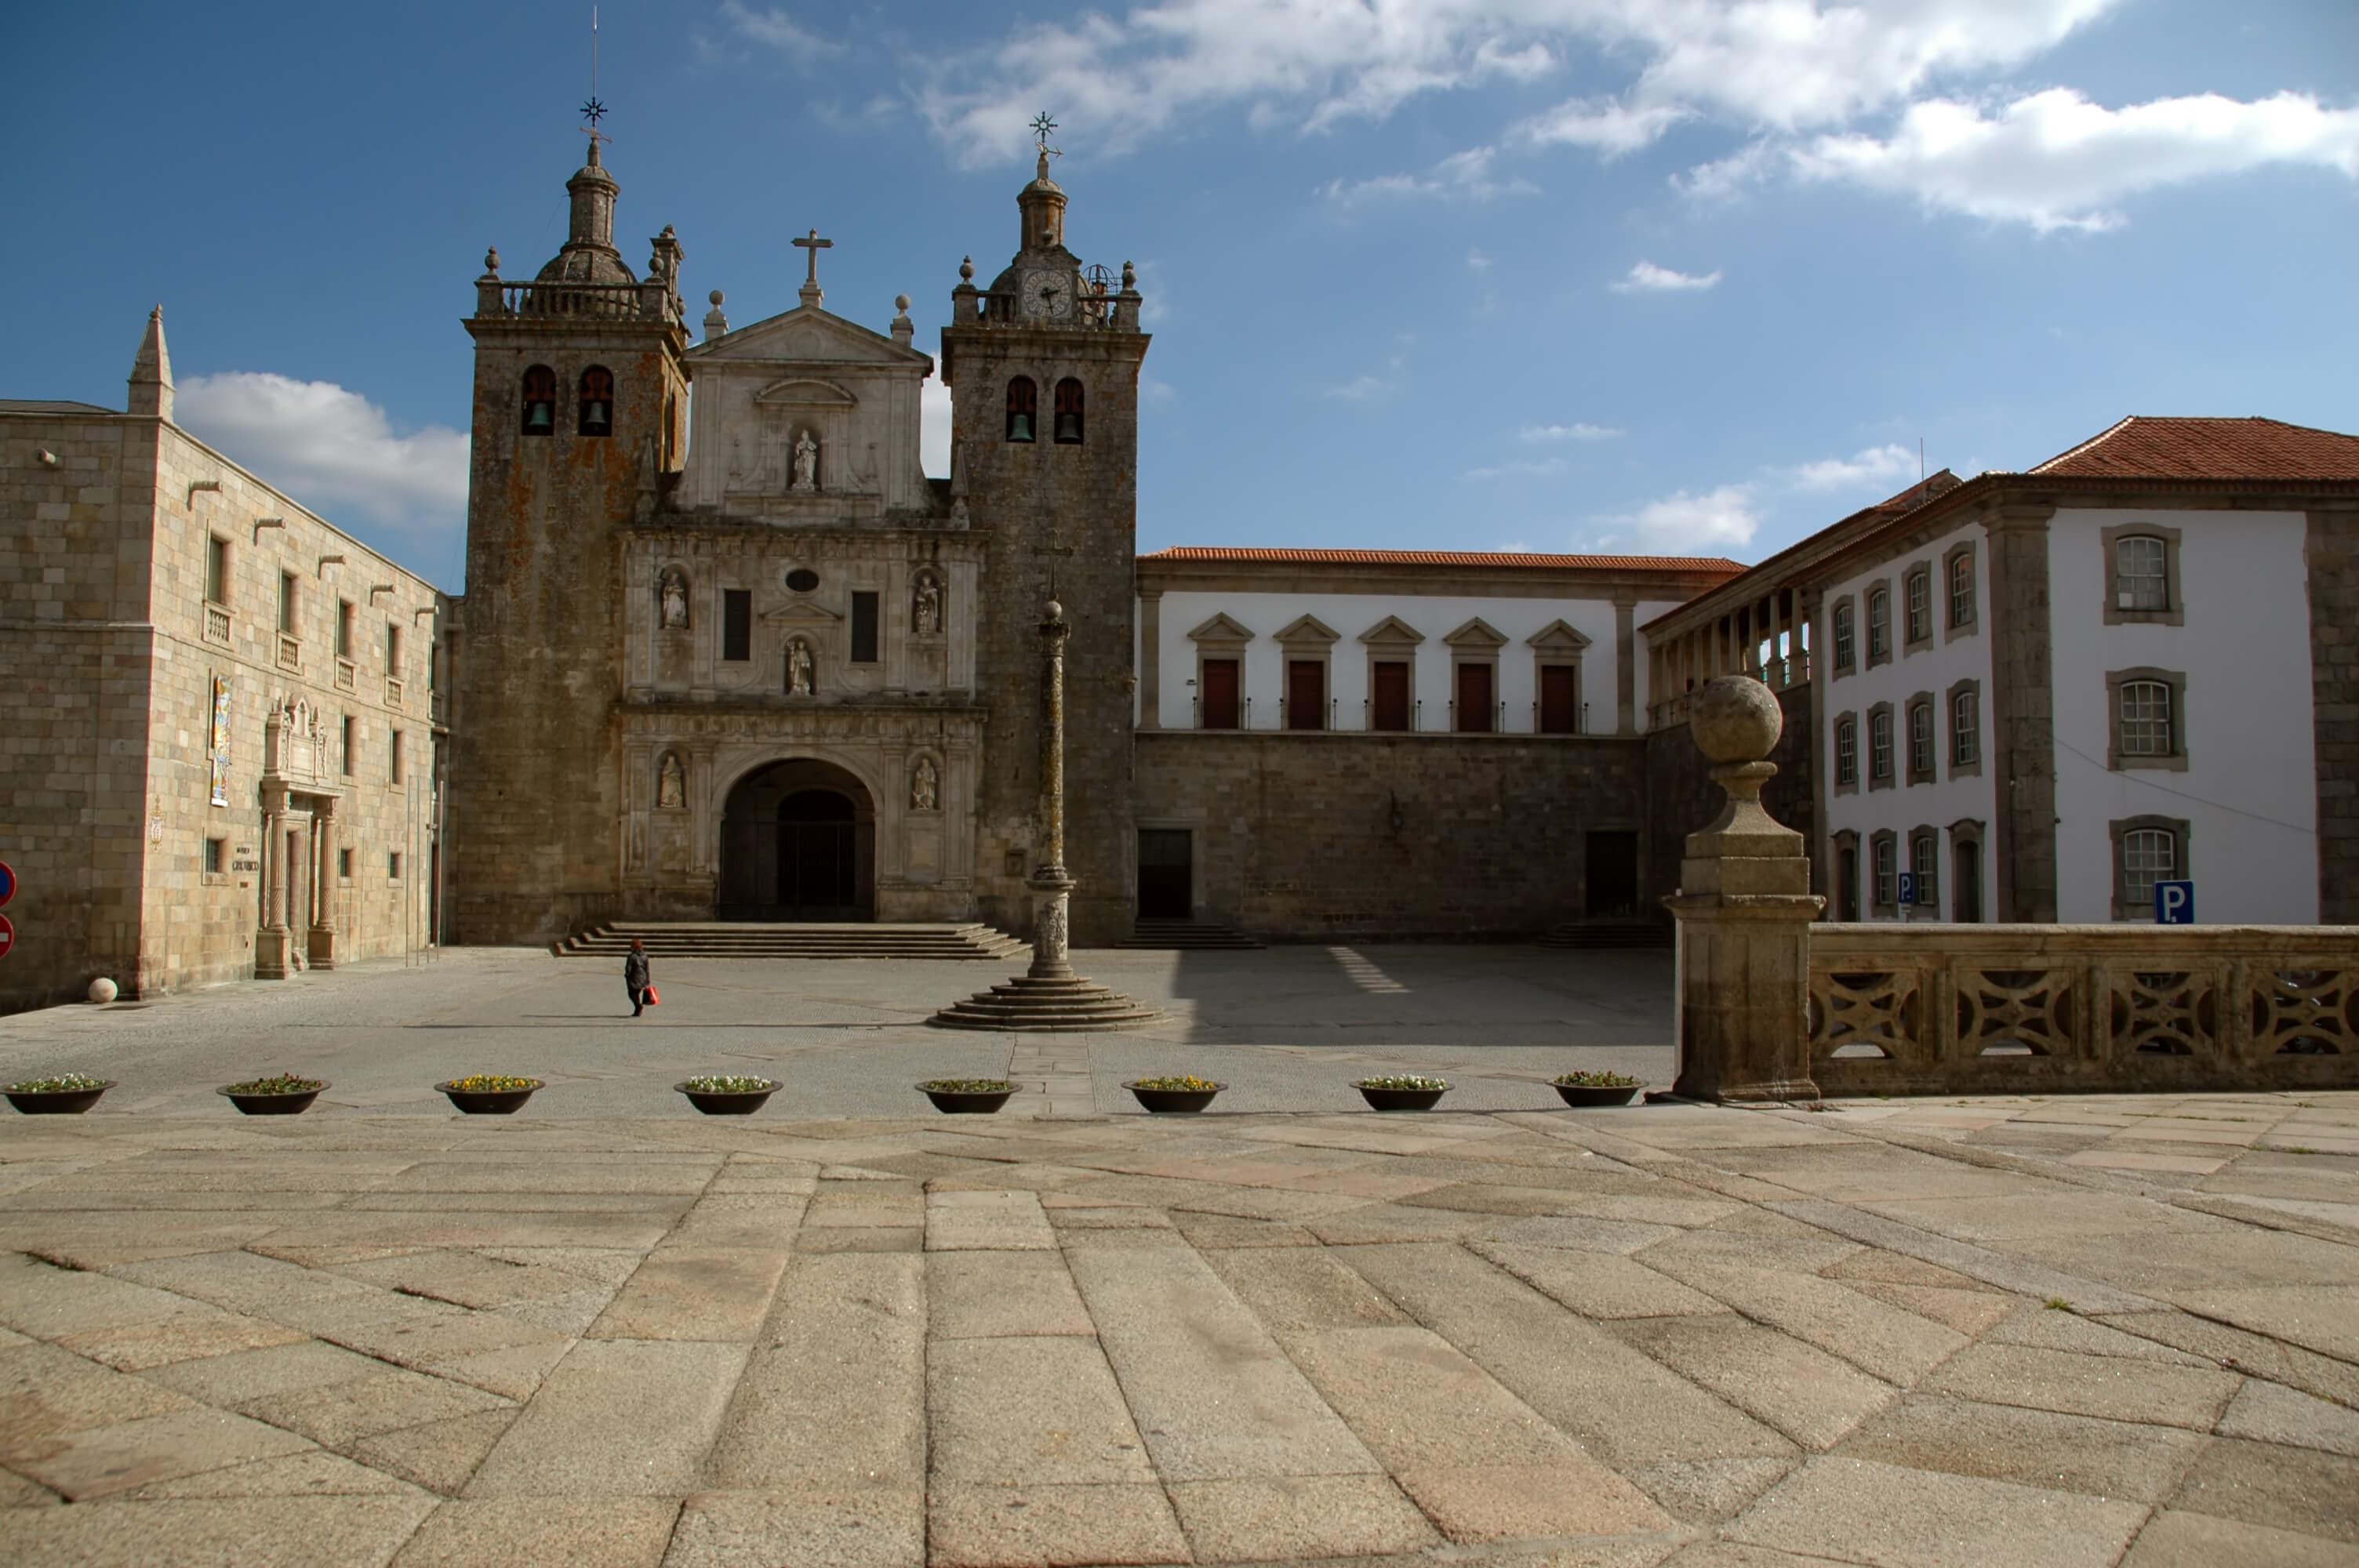 Portugal by Wine – Enoturismo em Portugal